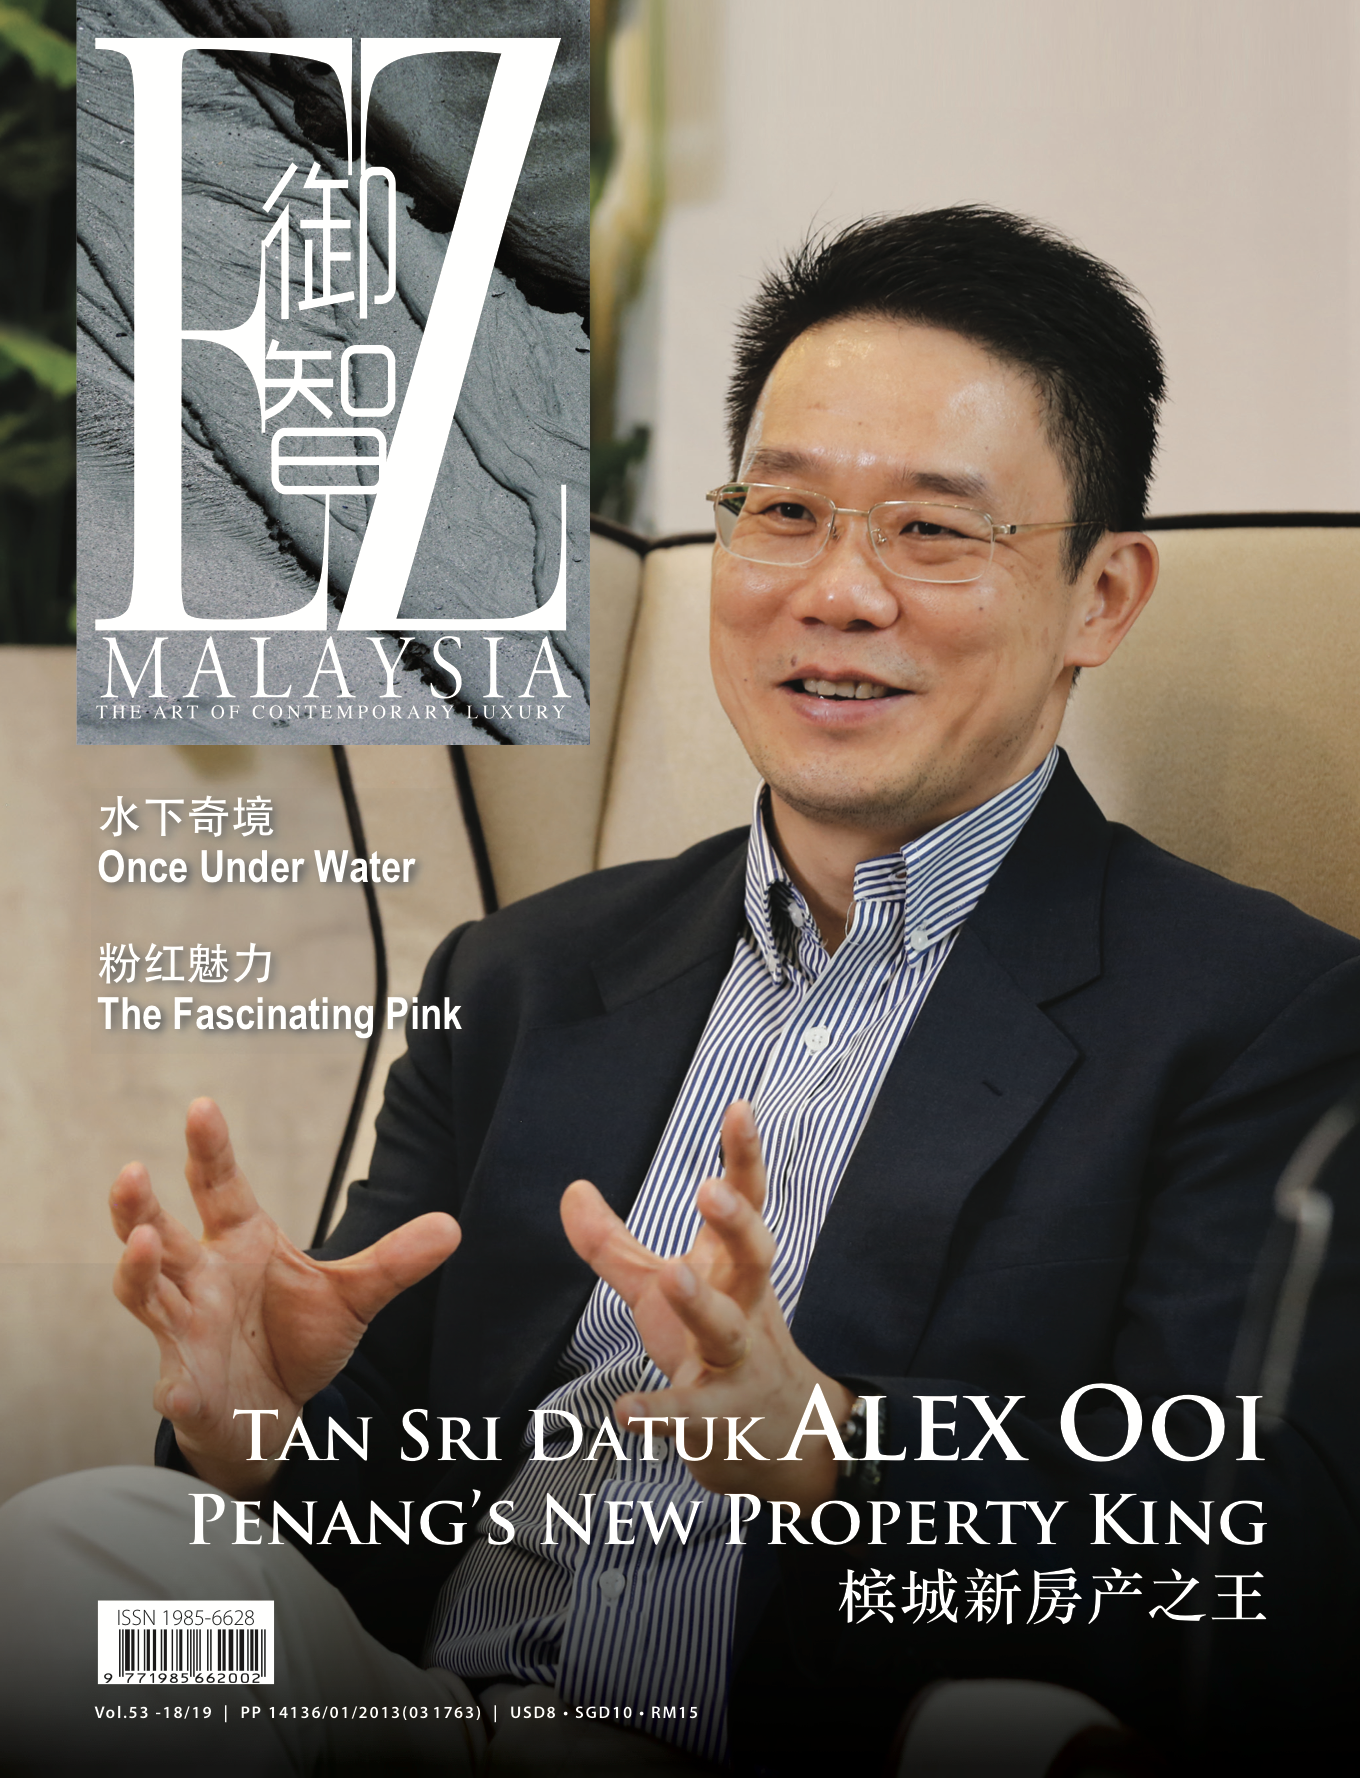 Tan Sri Datuk Alex Ooi.png